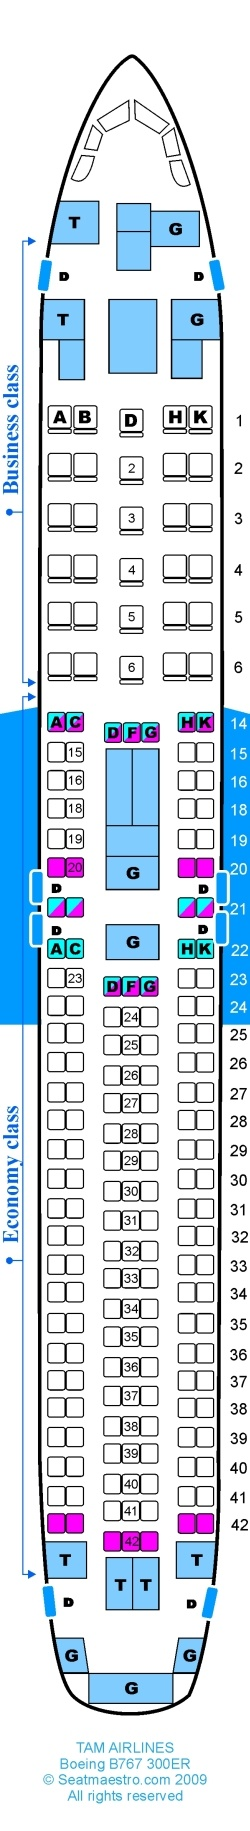 TAM Airlines - Boeing B767 300ER Mapa de asientos